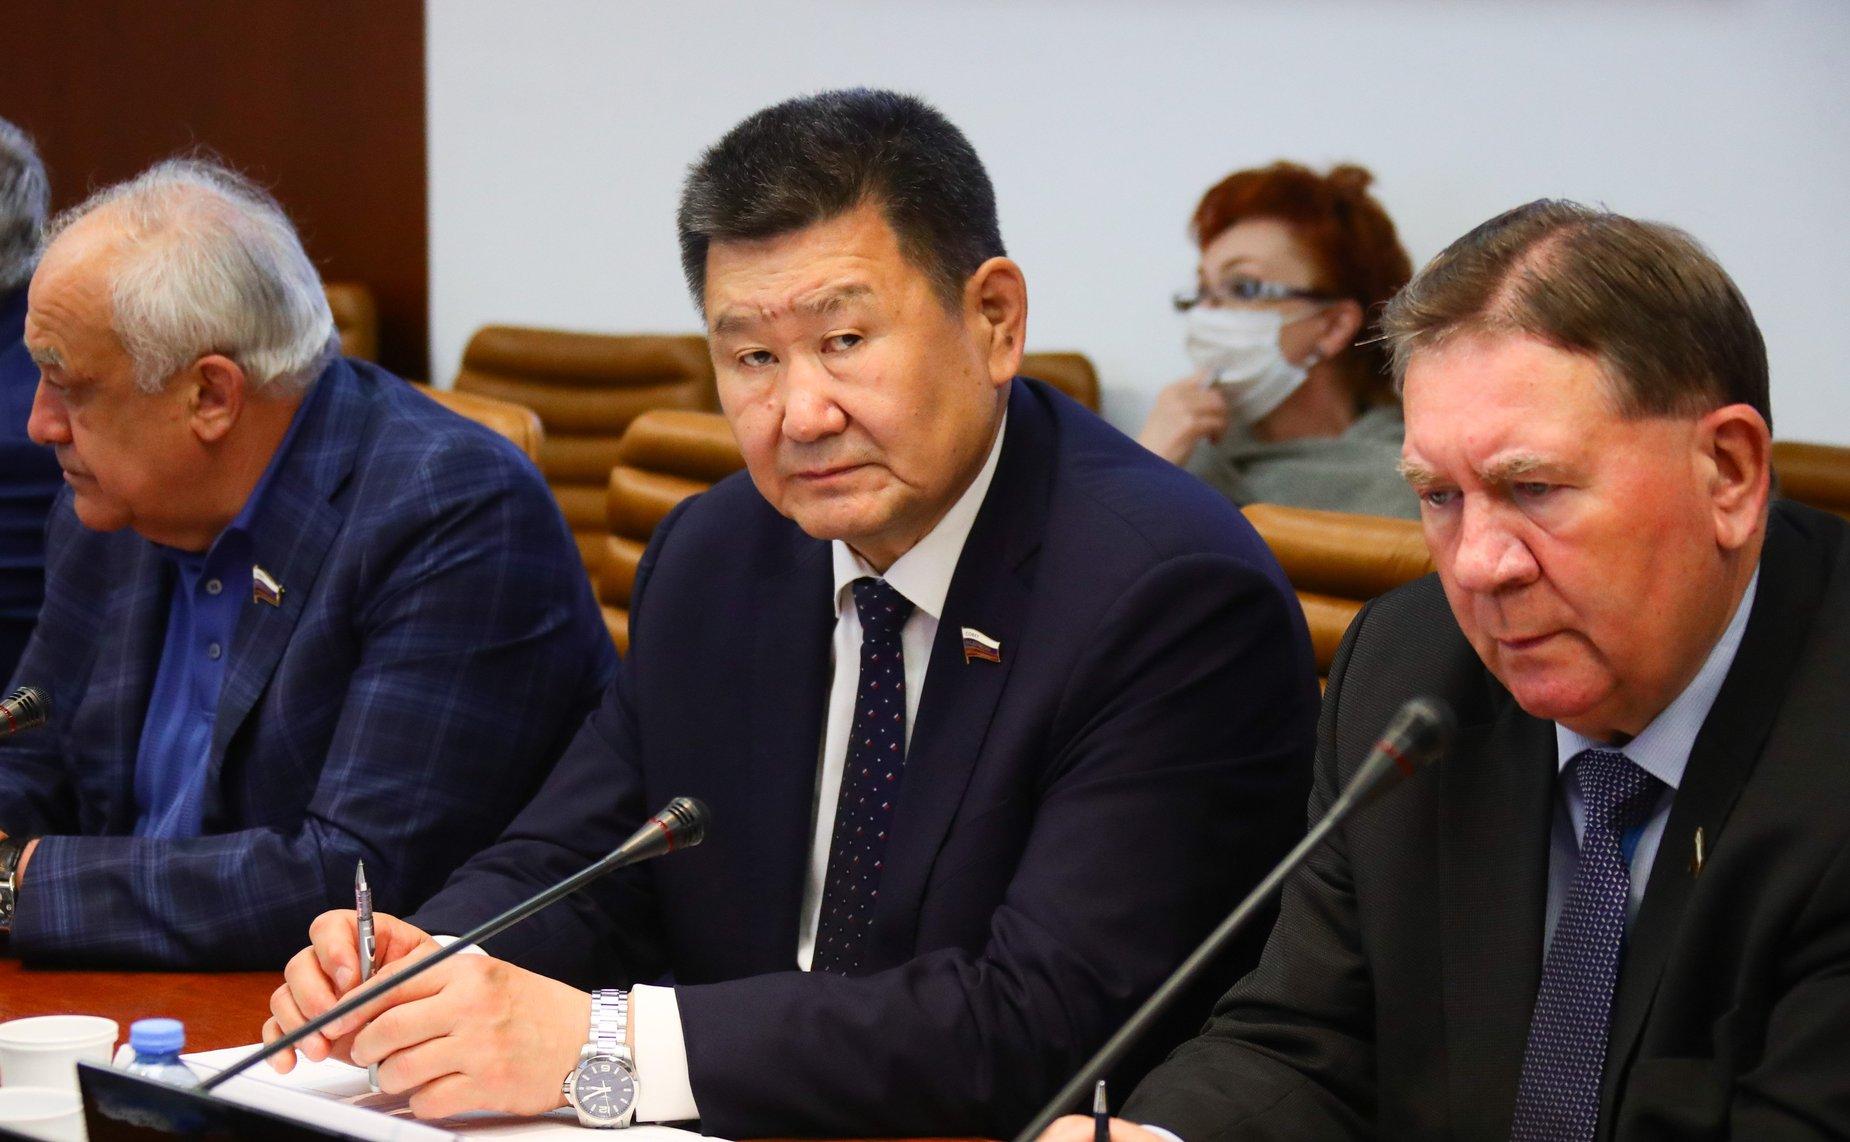 Вячеслав Мархаев покидает пост сенатора Совета Федерации от Иркутской области